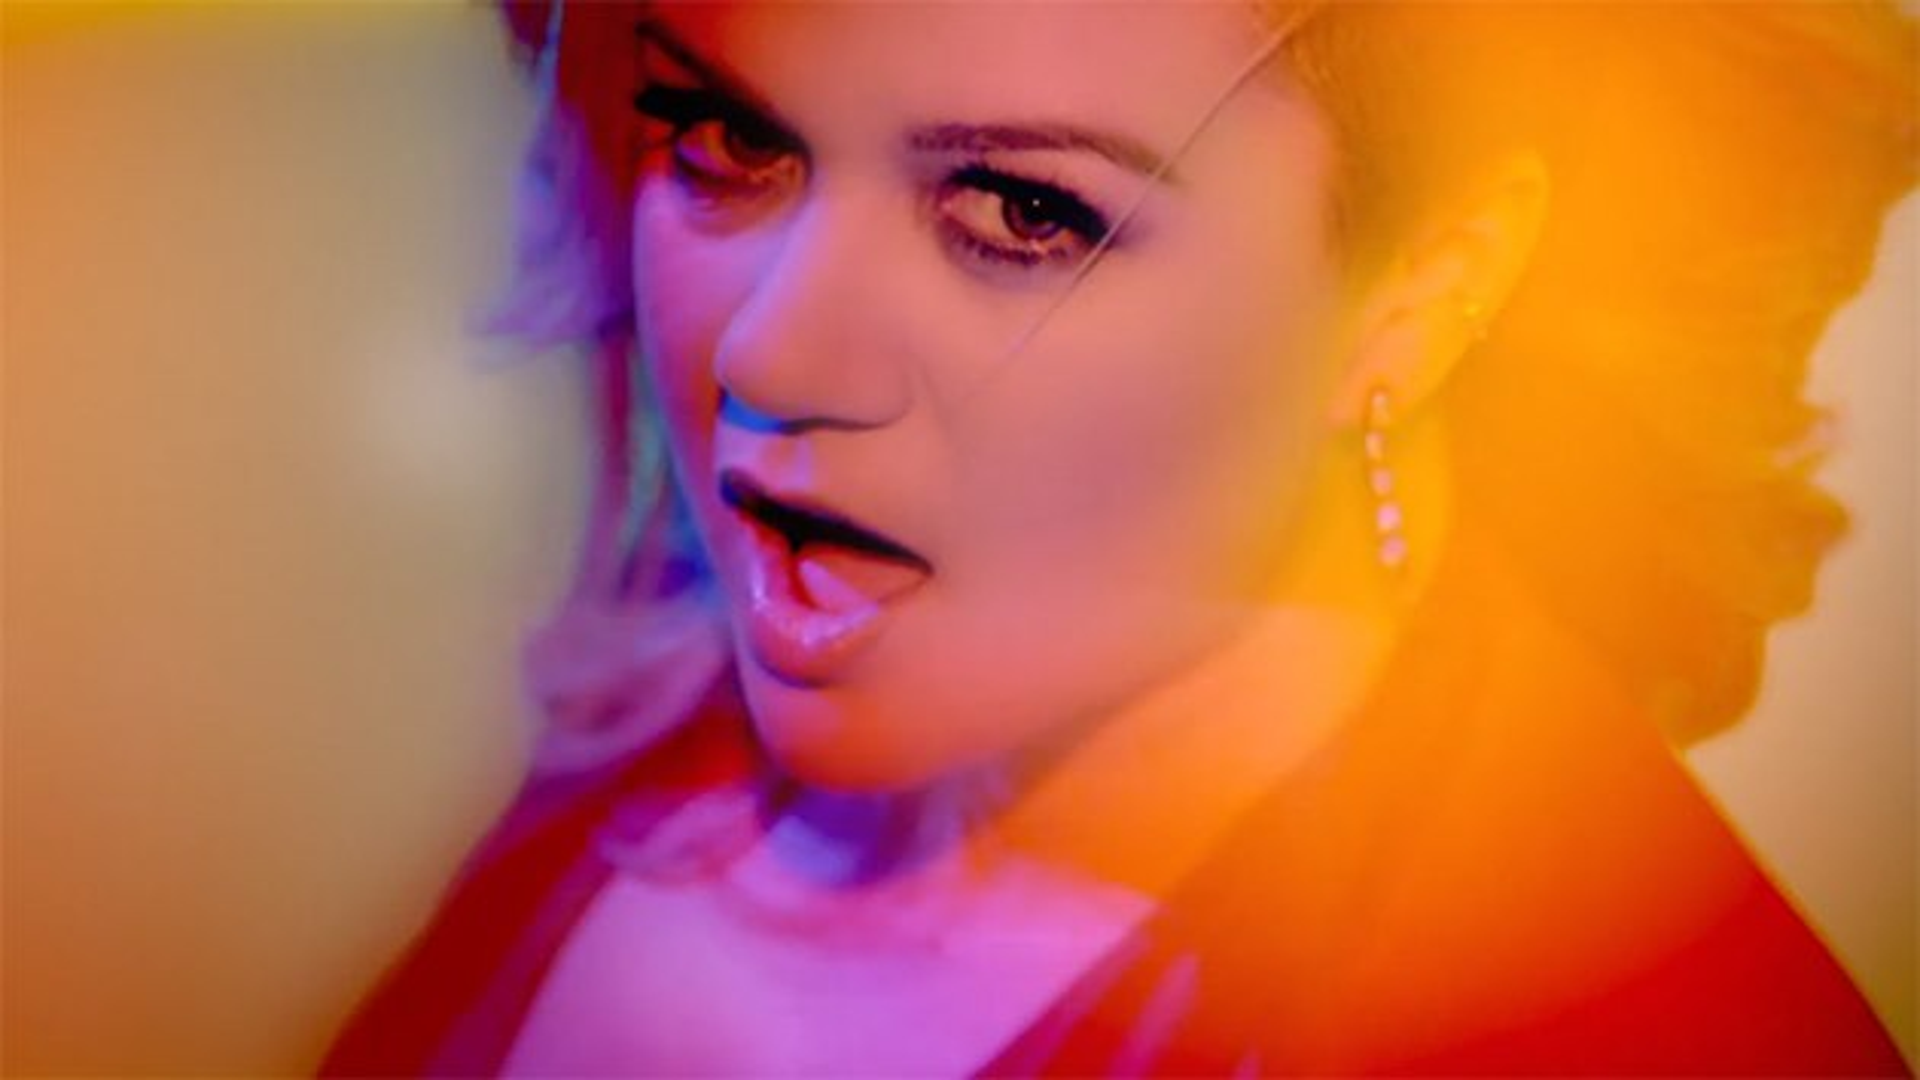 Kelly-Clarkson-Heartbeat-Song-Musikvideo